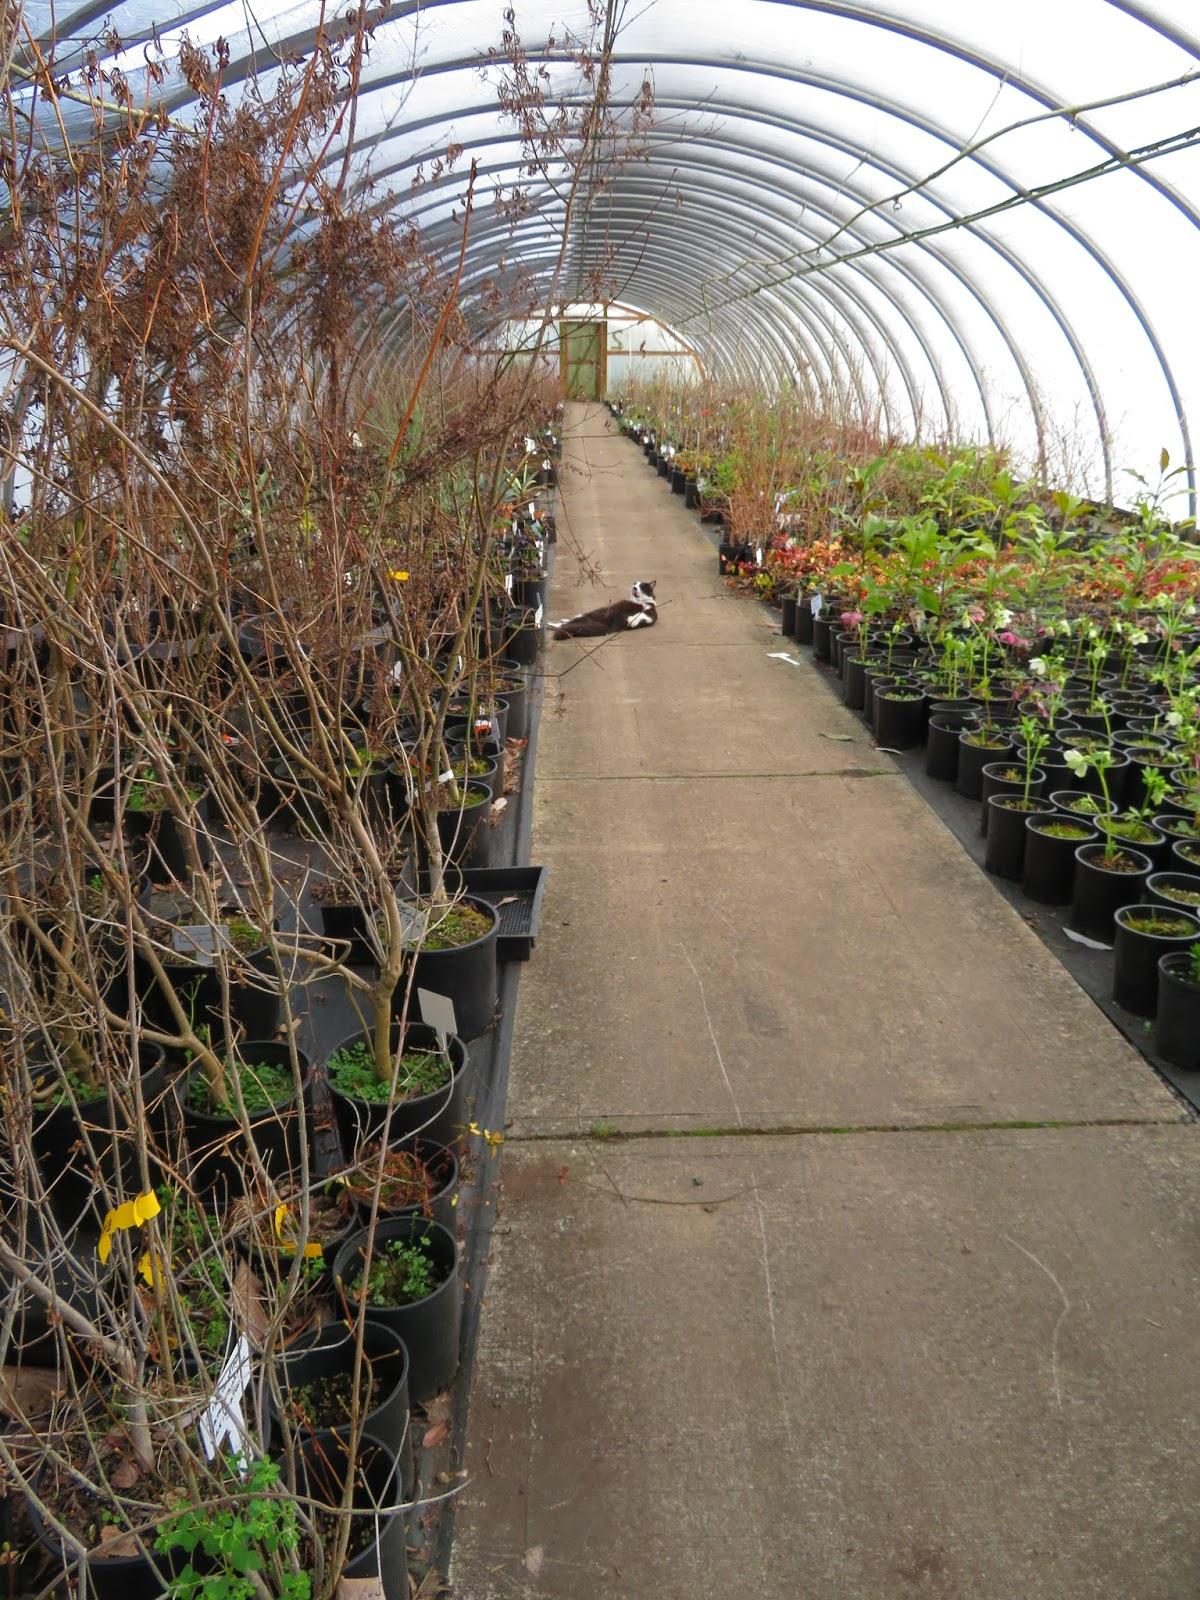 Nursery Visit: Gossler Farm Nursery Part II